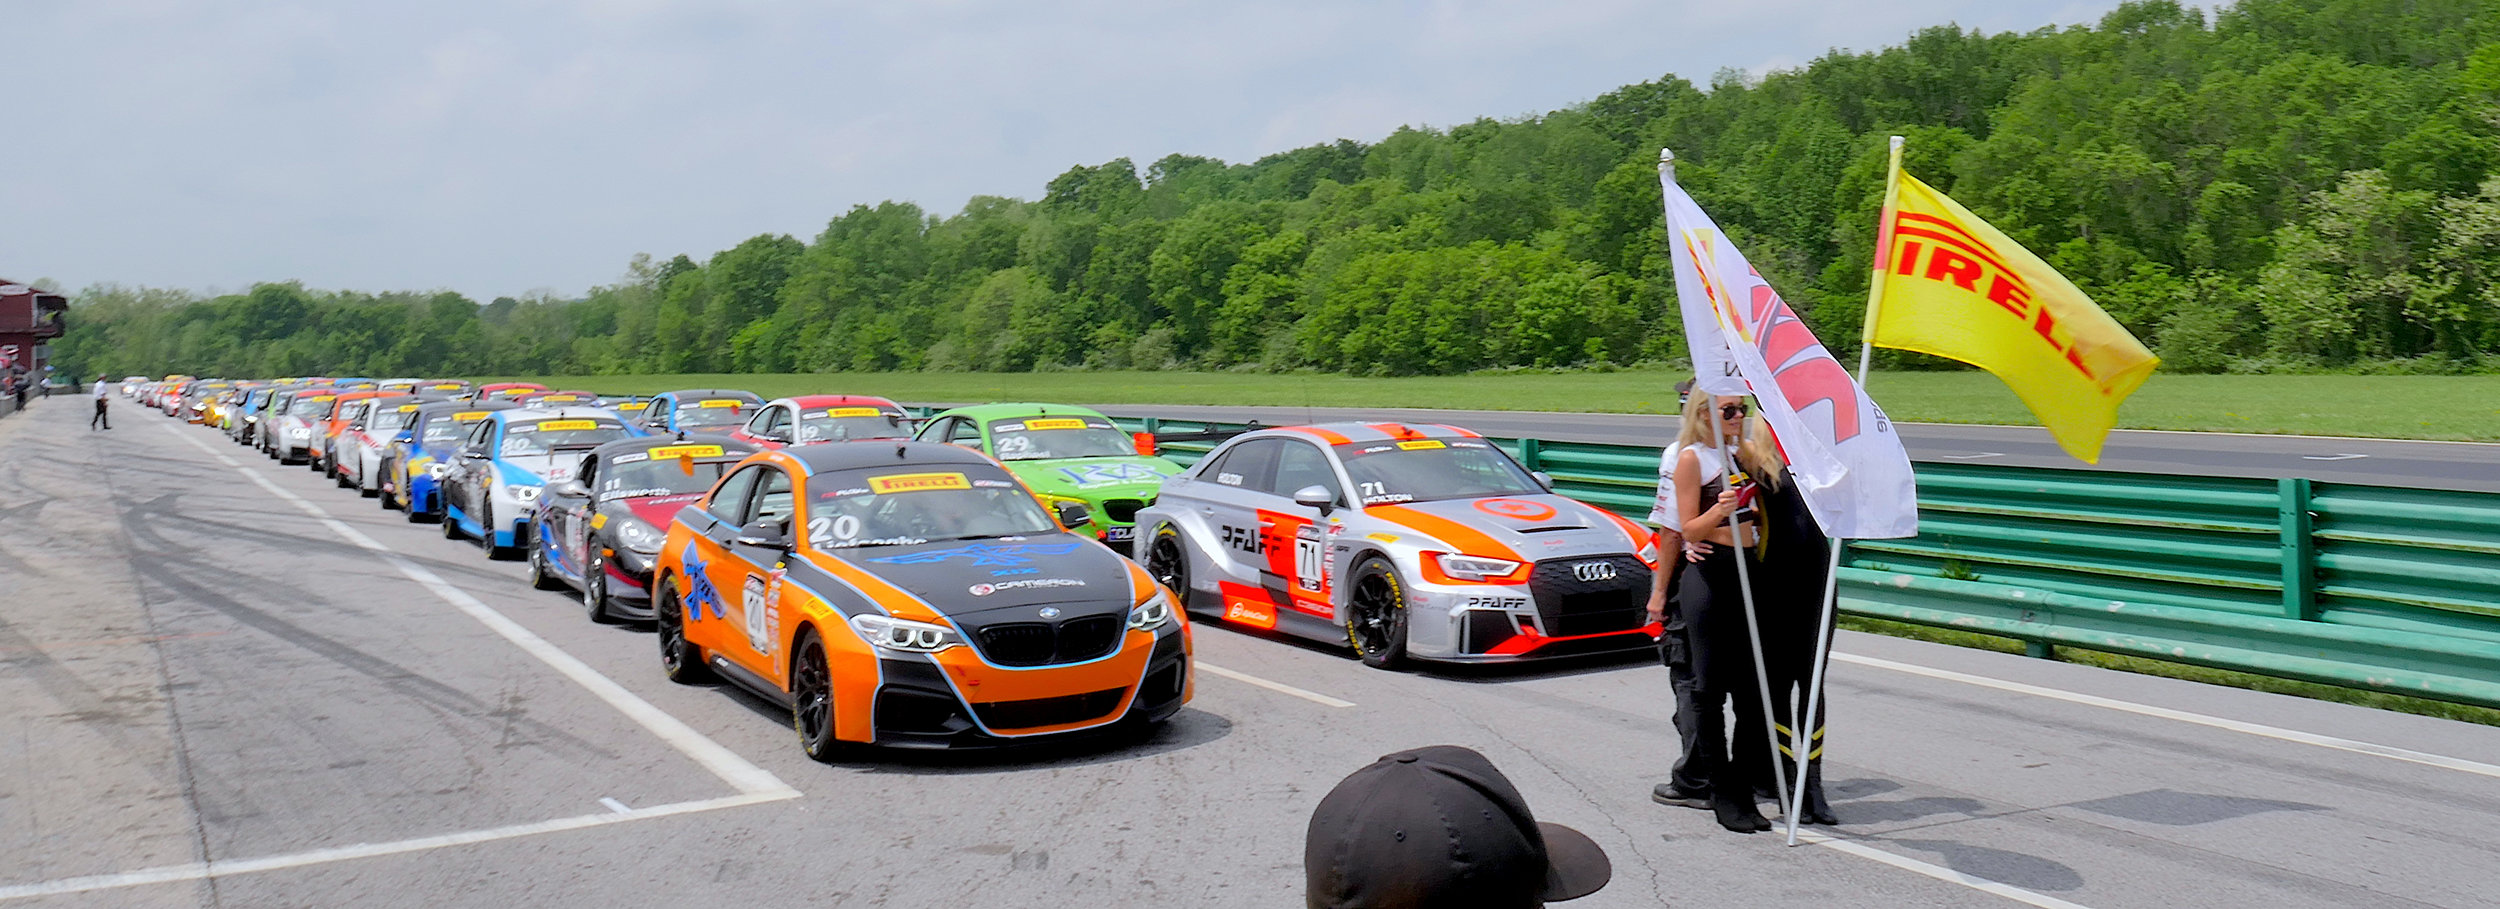 P1010328_PWC_RaceReady.jpg